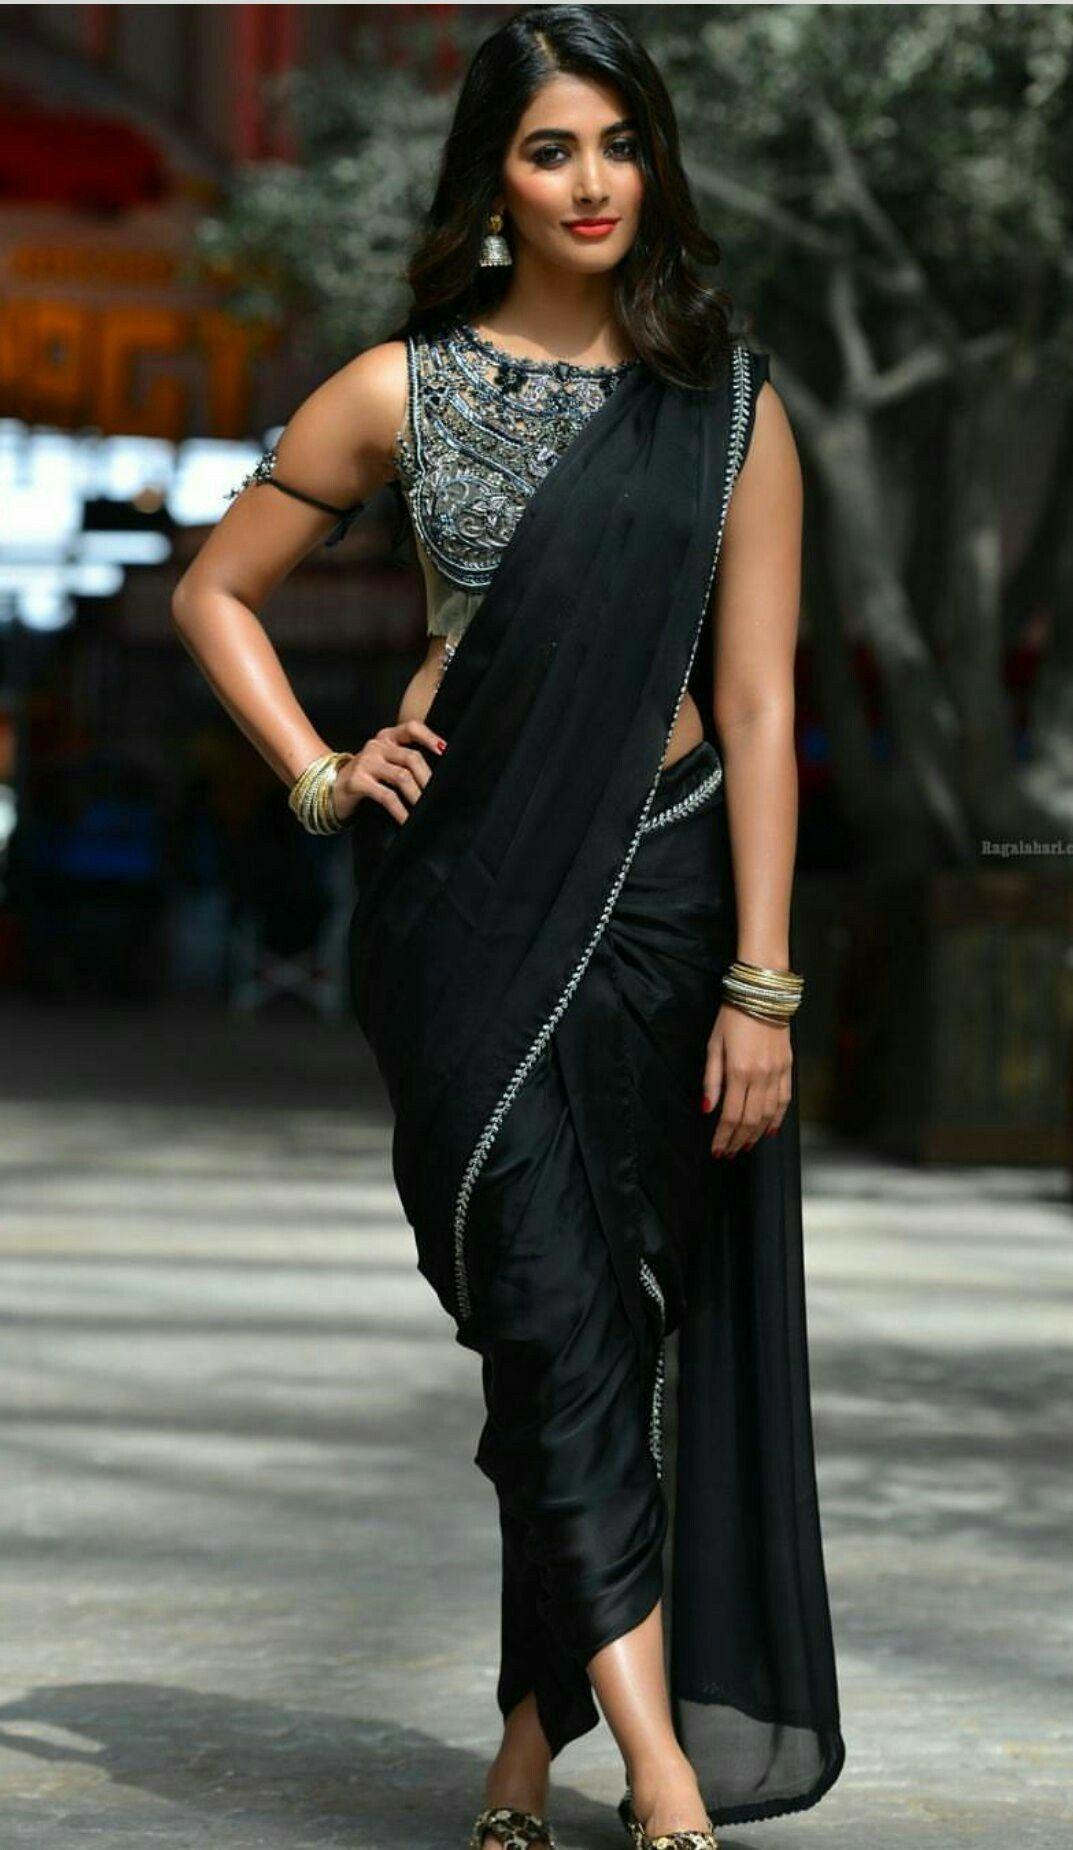 Hot Pooja Hegde In Black Saree From Dj Movie In 2019 -8106